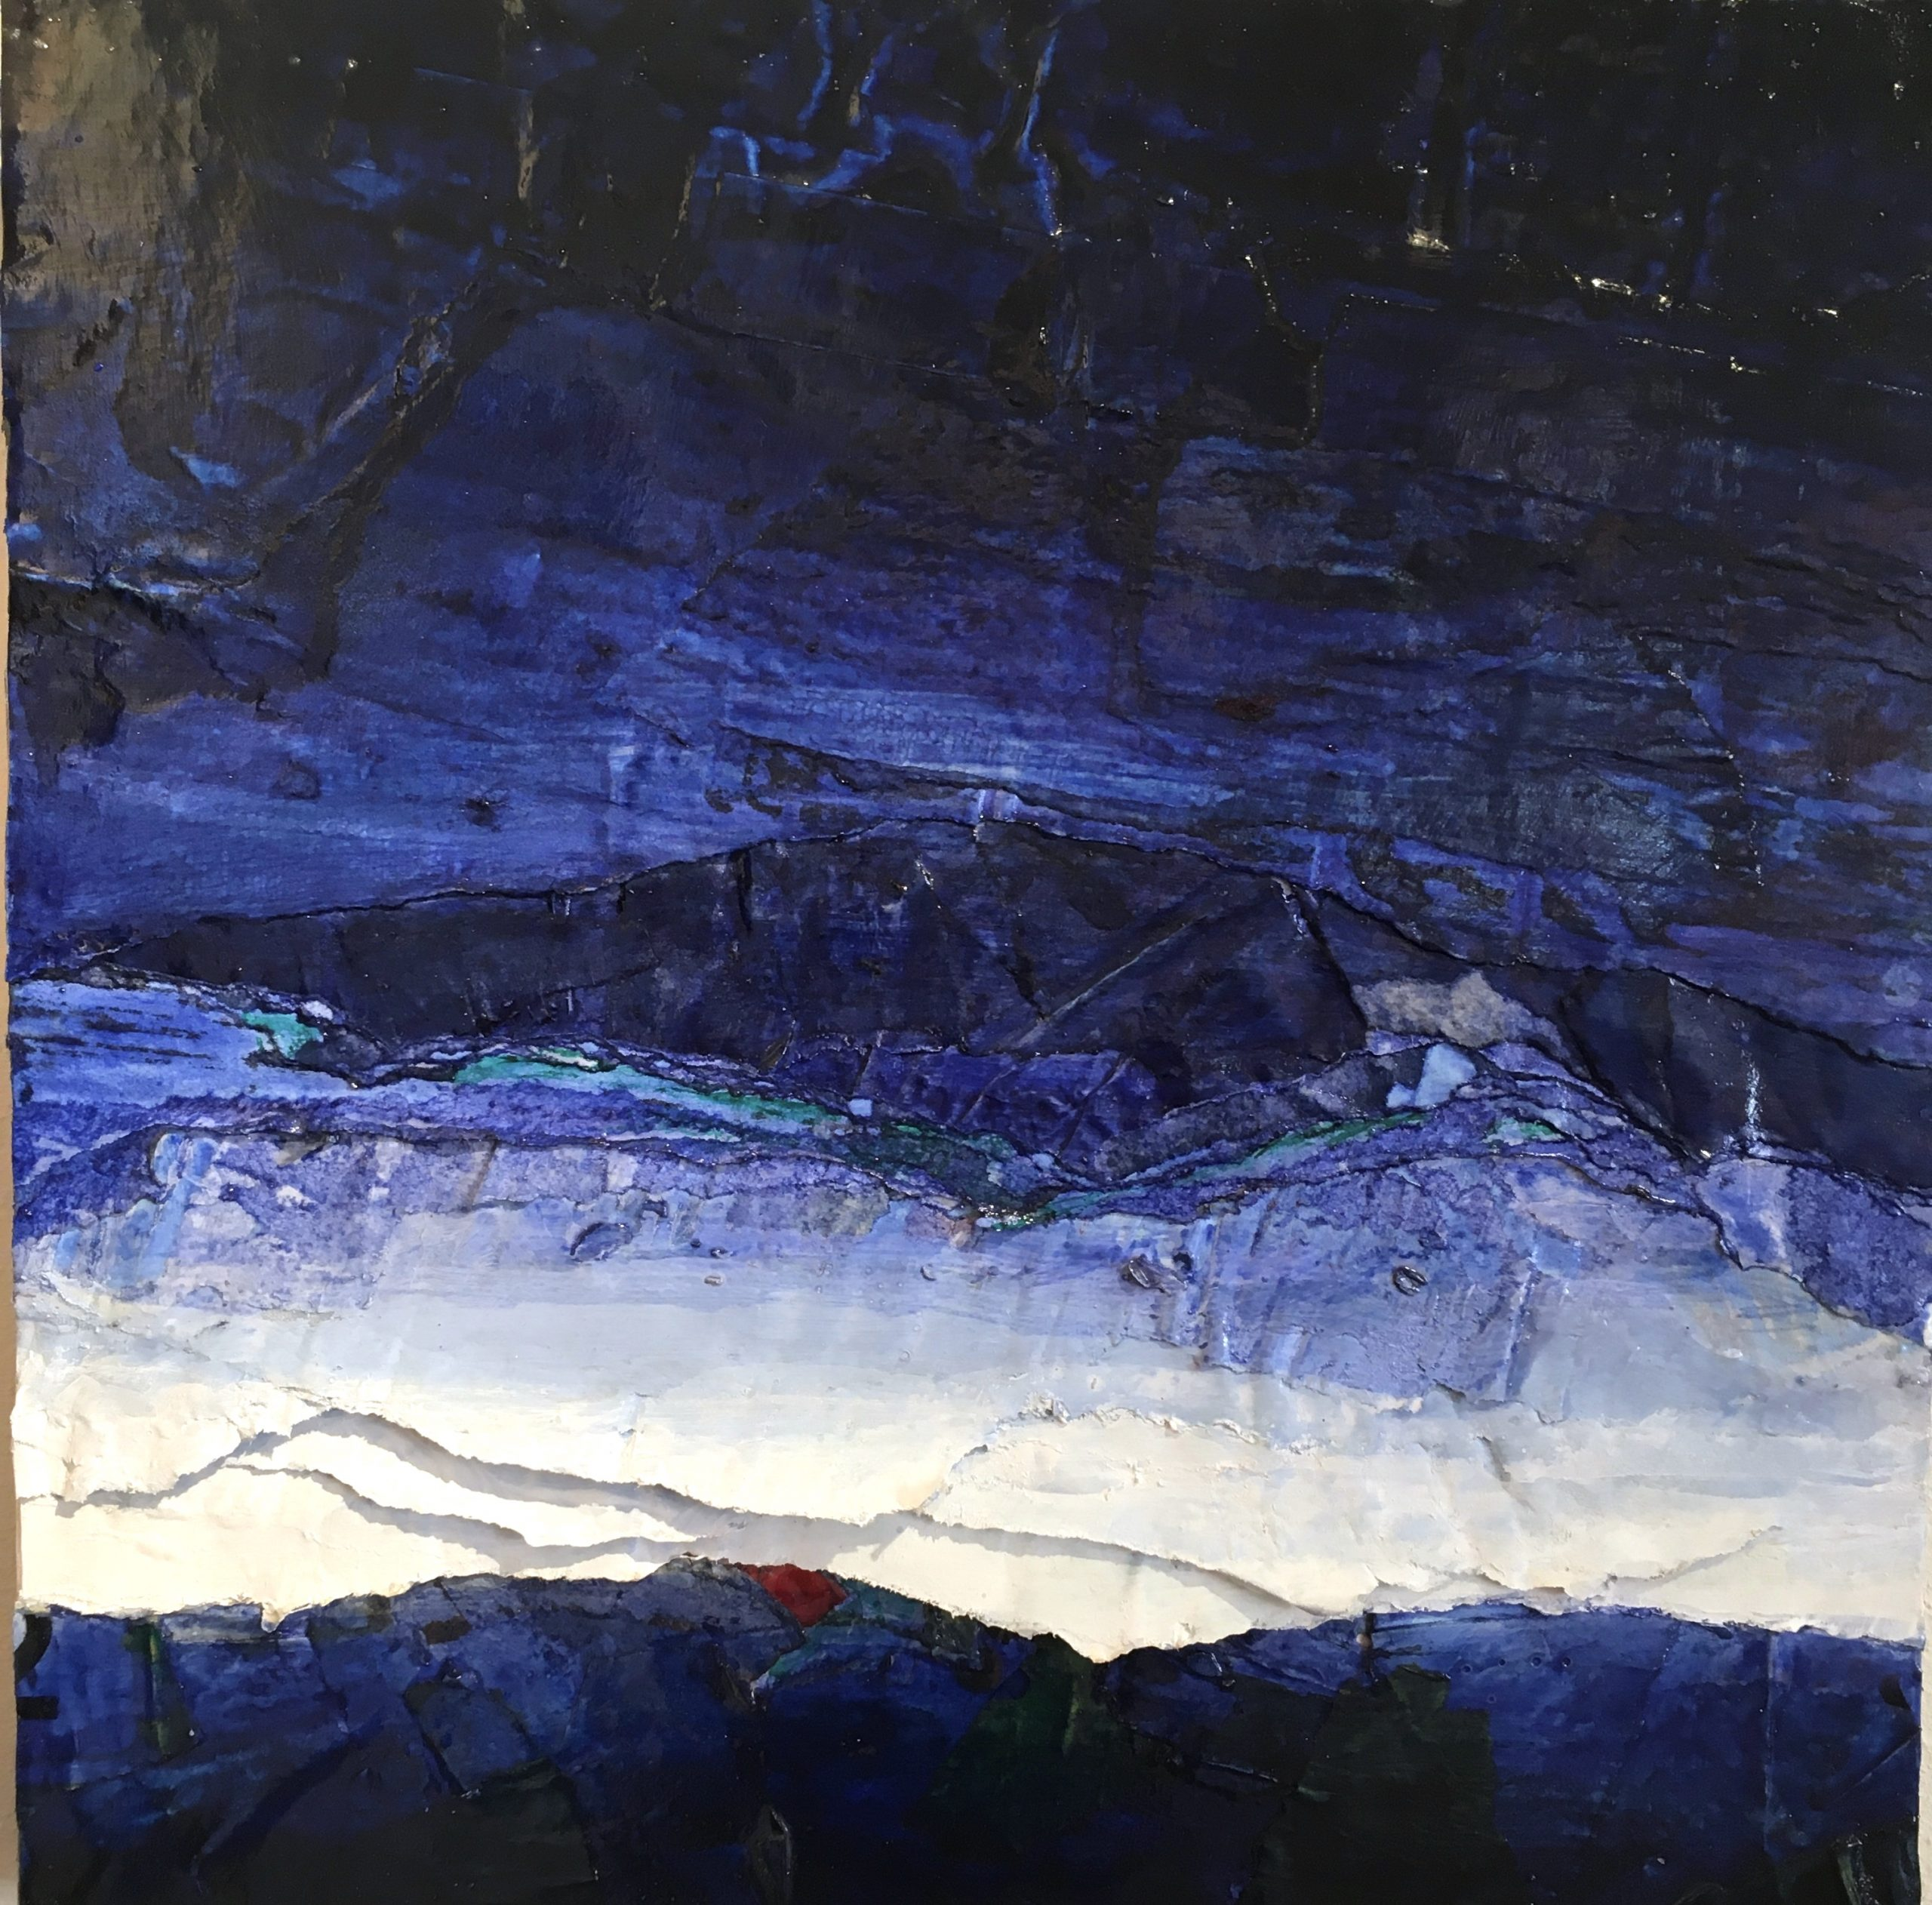 hemmes-40×40 in blu